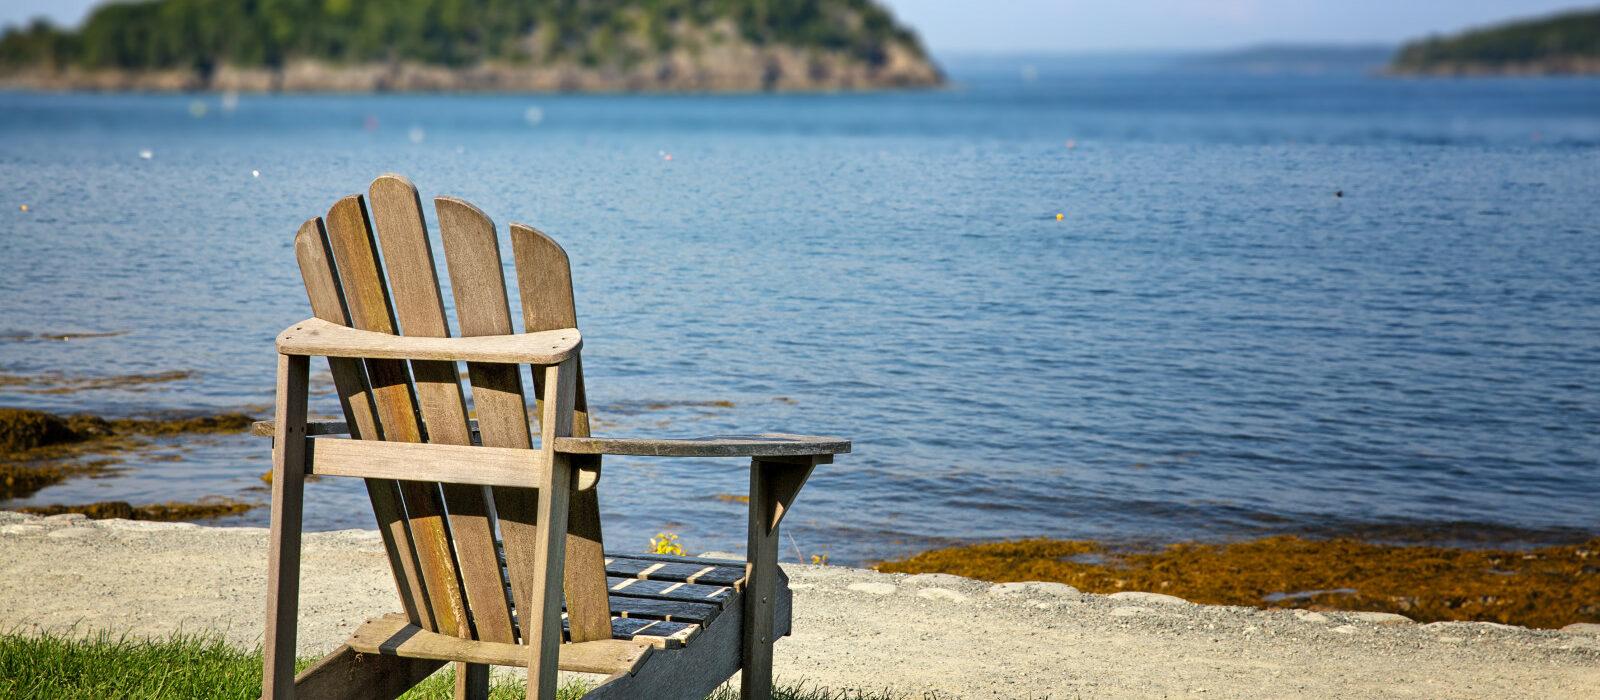 Our Favorite Maine Beaches